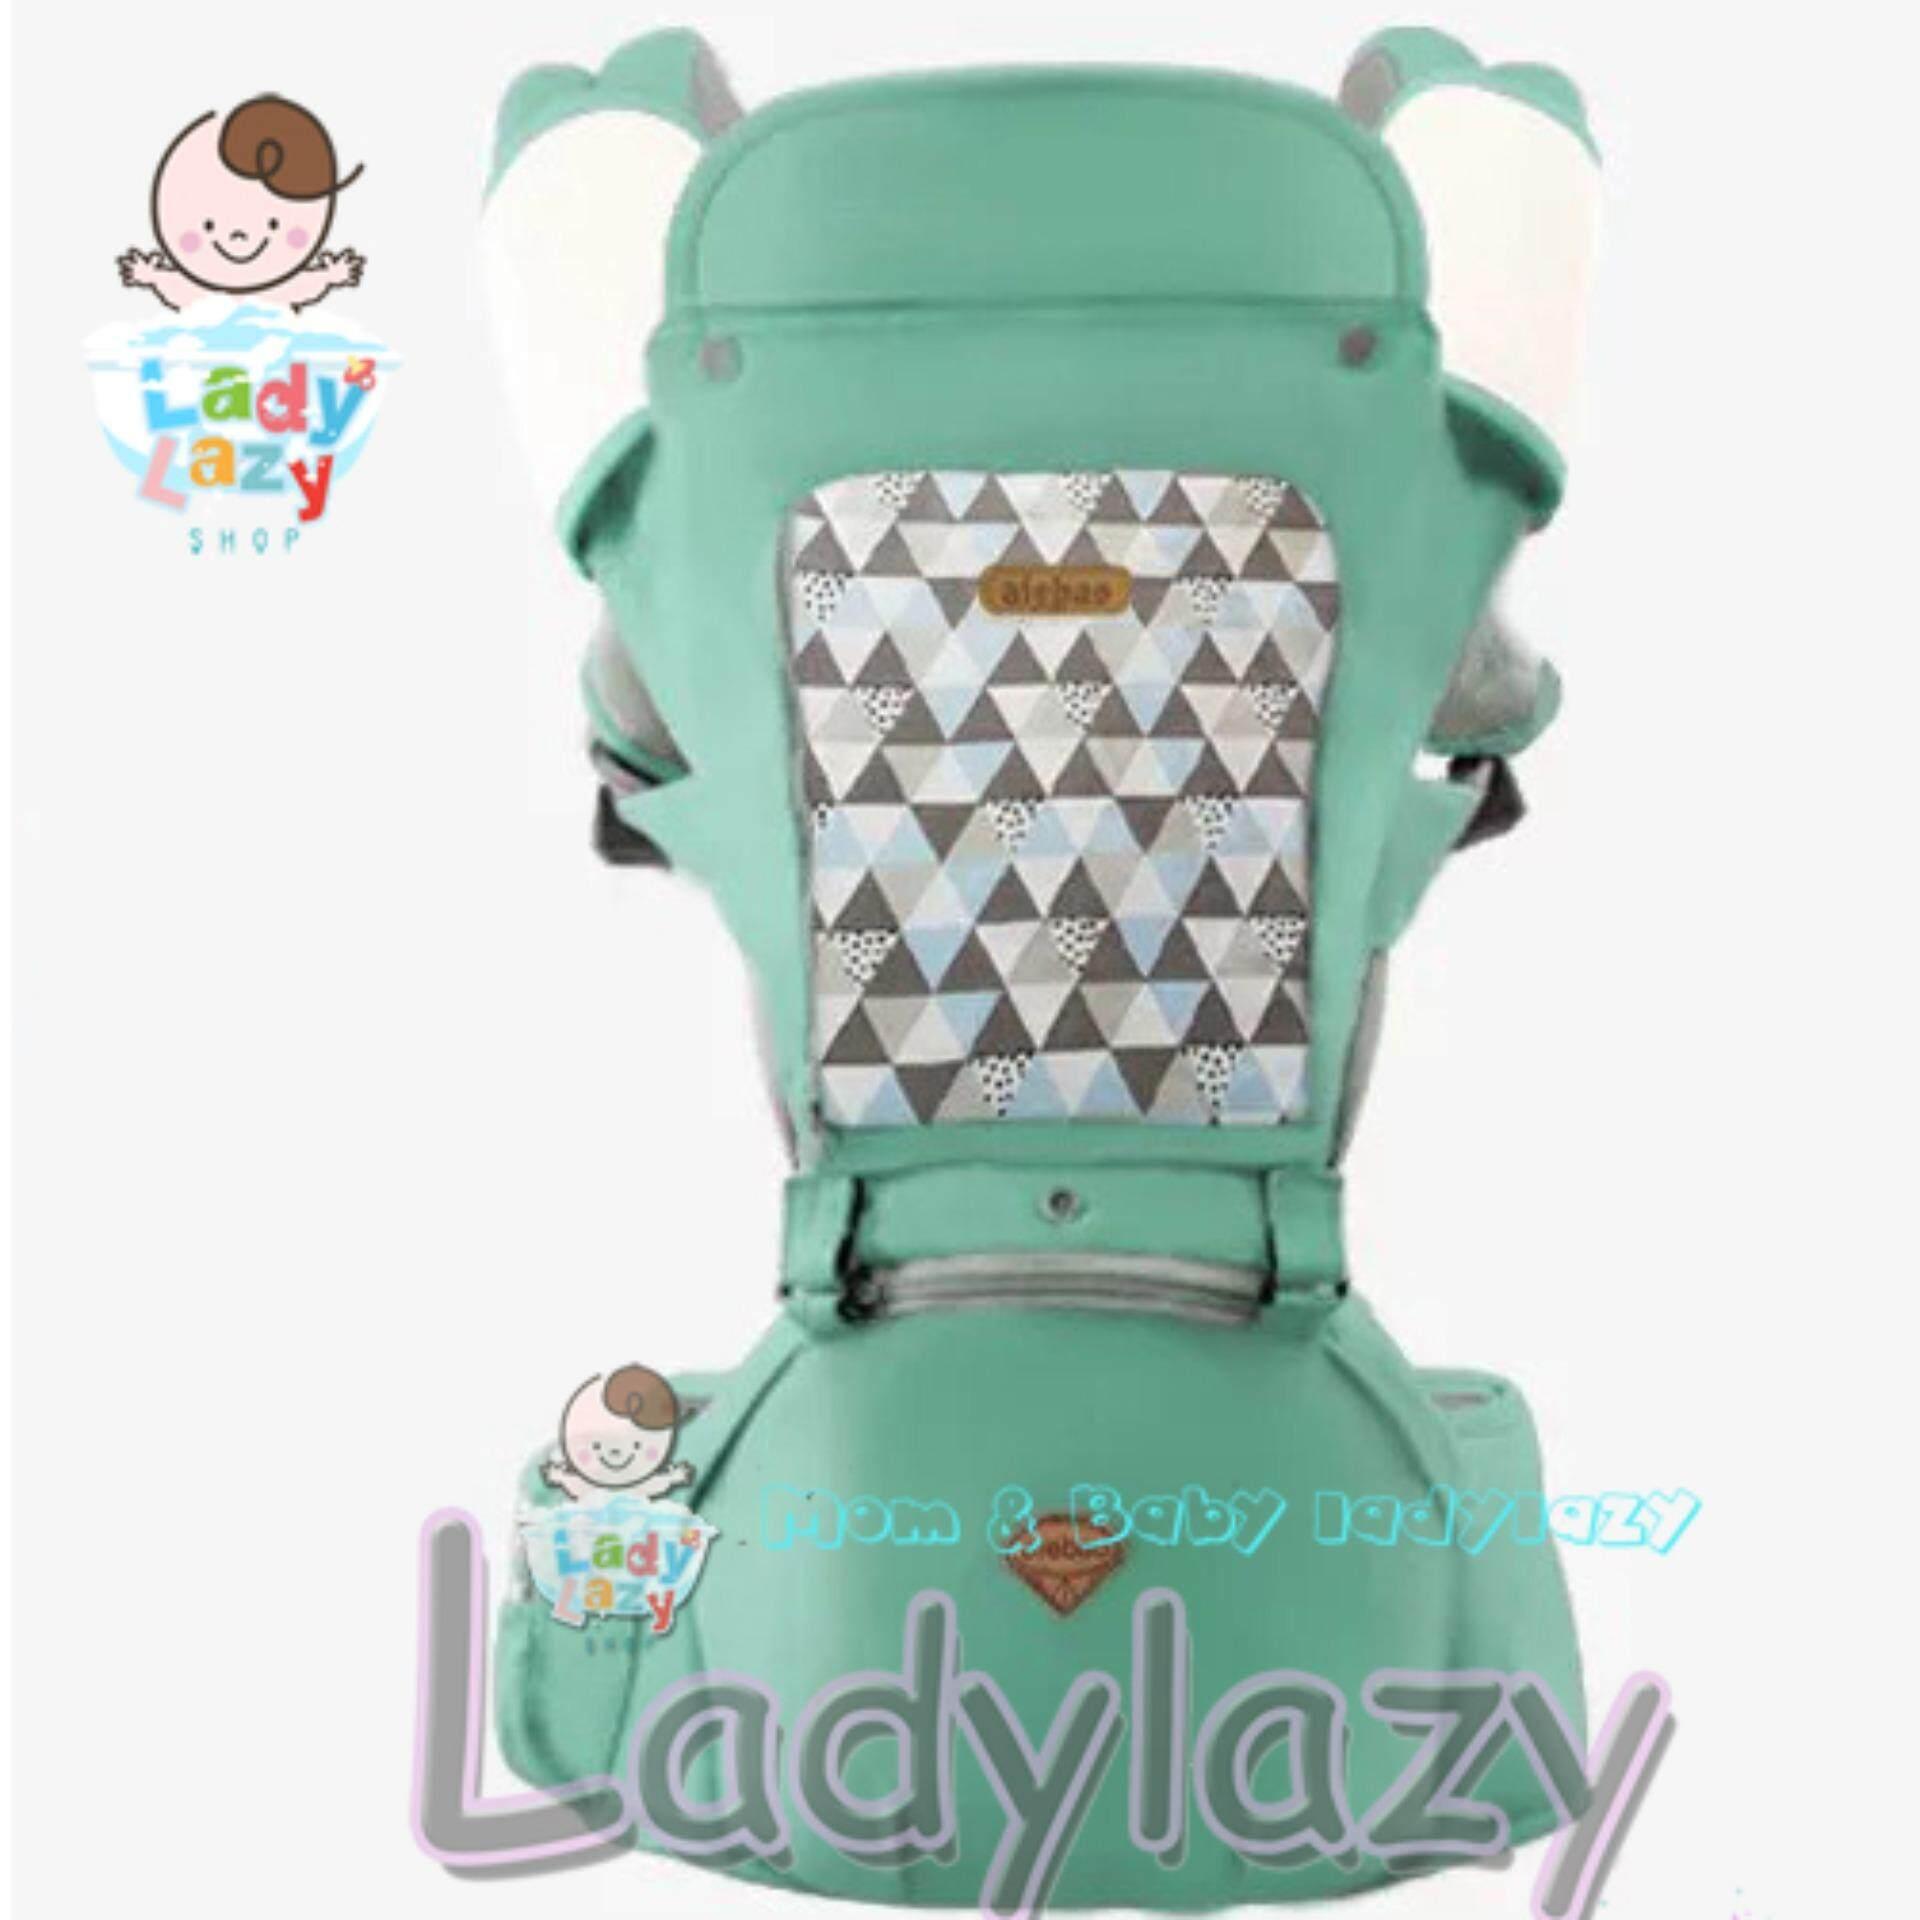 Ladylazyเป้อุ้มเด็ก(aiebao) Hip Seat 2in1 มีหมวกคลุมและปลอกกันน้ำลาย พาสเทล สีเขียว  Pantip พันทิปรีวิว